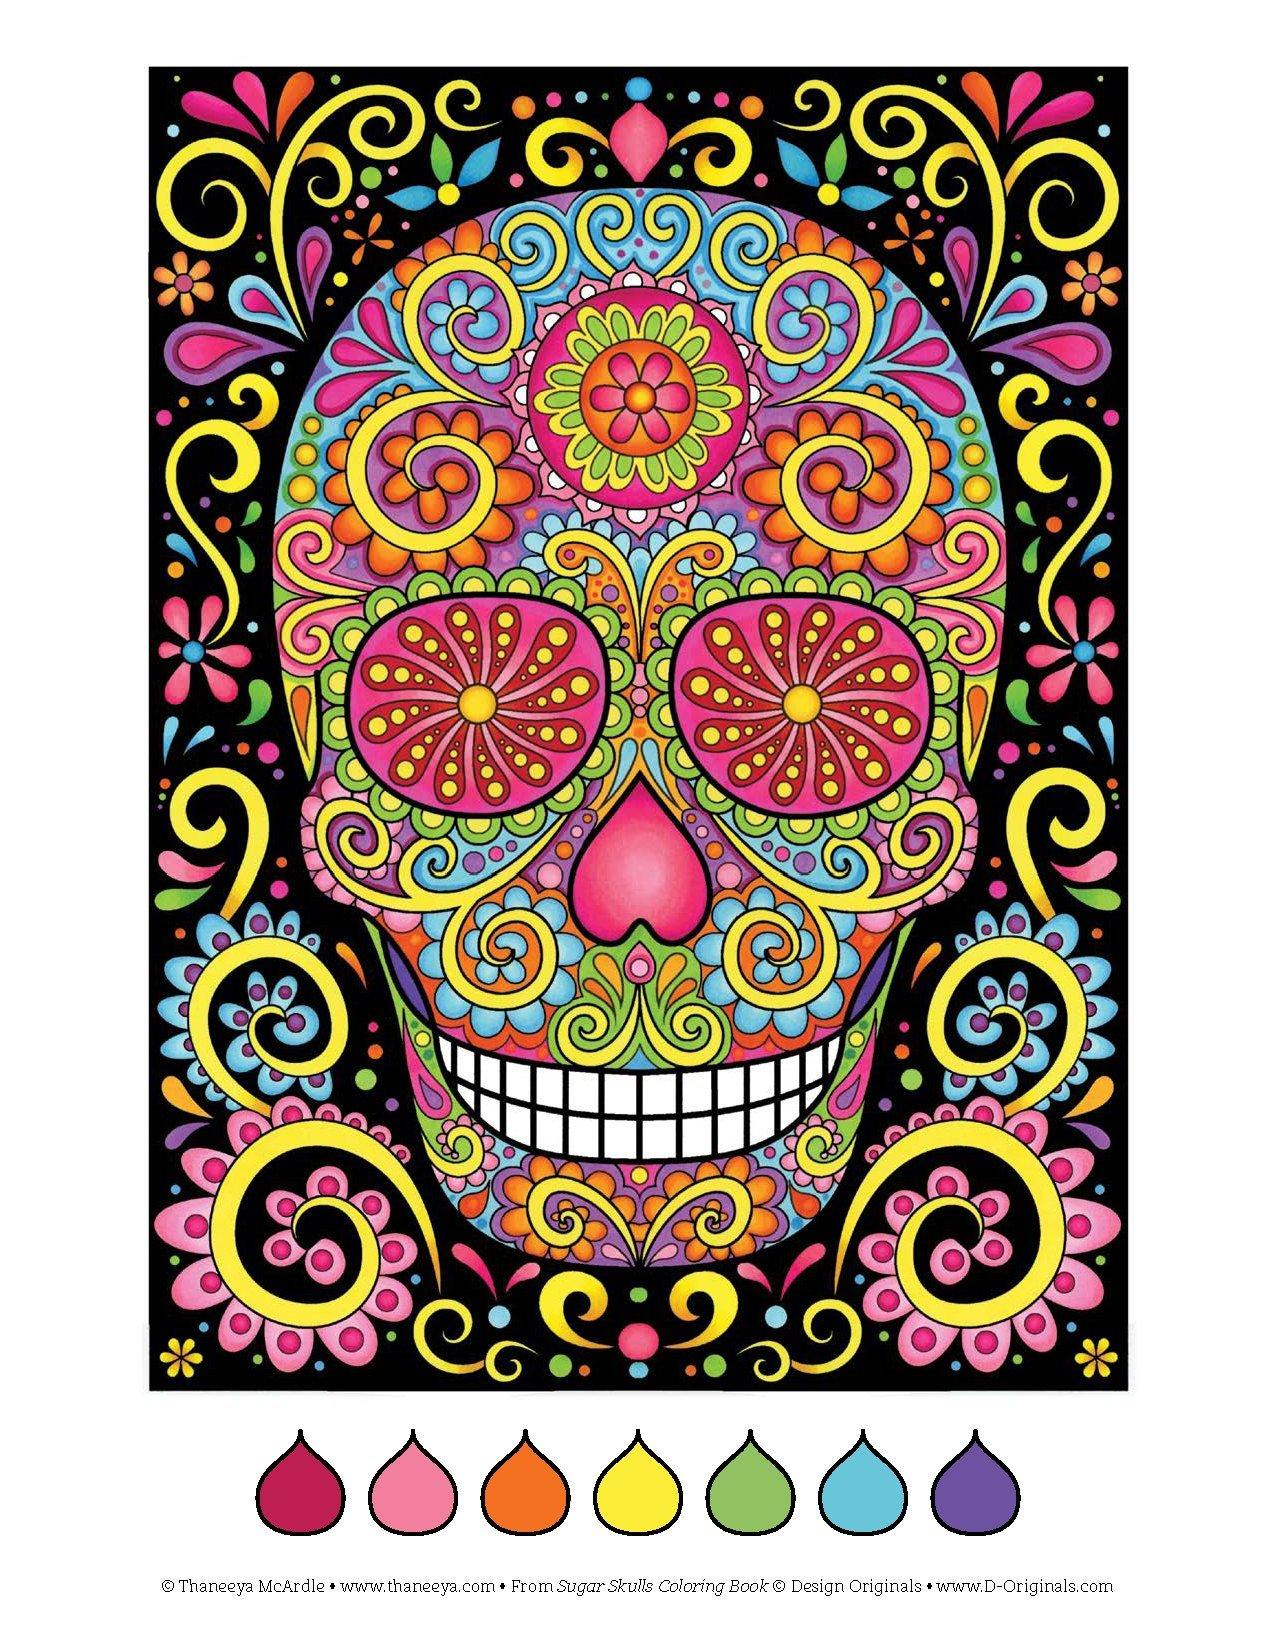 Amazon.com: Sugar Skulls Coloring Book (Coloring Is Fun) (Design ...